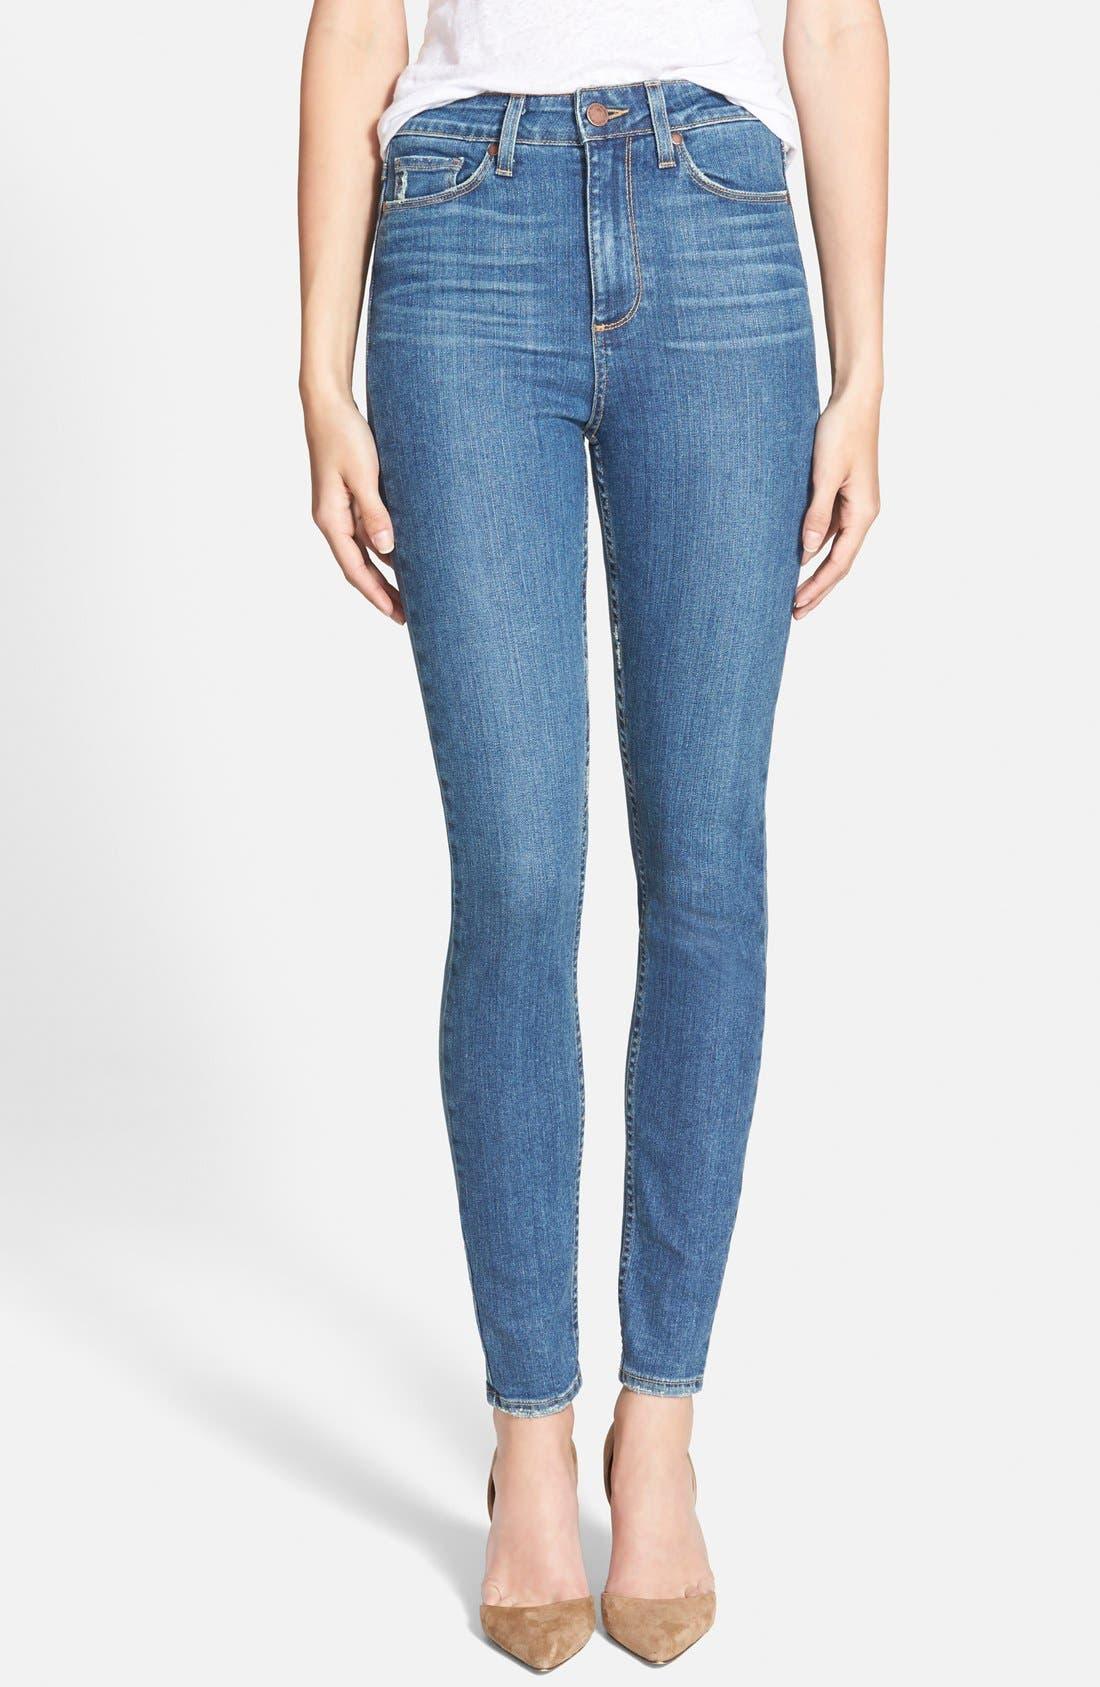 Alternate Image 1 Selected - Paige Denim 'Margo' High Rise Ultra Skinny Jeans (Mira)